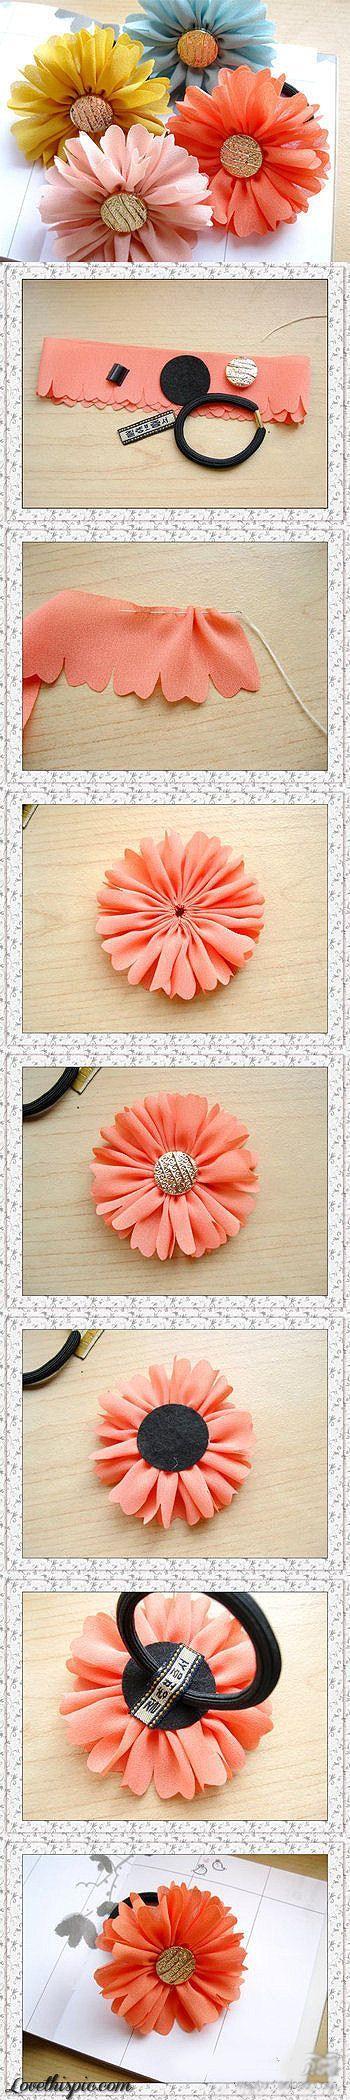 DIY Craft Flowers flowers diy crafts home made easy crafts craft idea crafts ideas diy ideas diy crafts diy idea do it yourself diy projects diy craft handmade